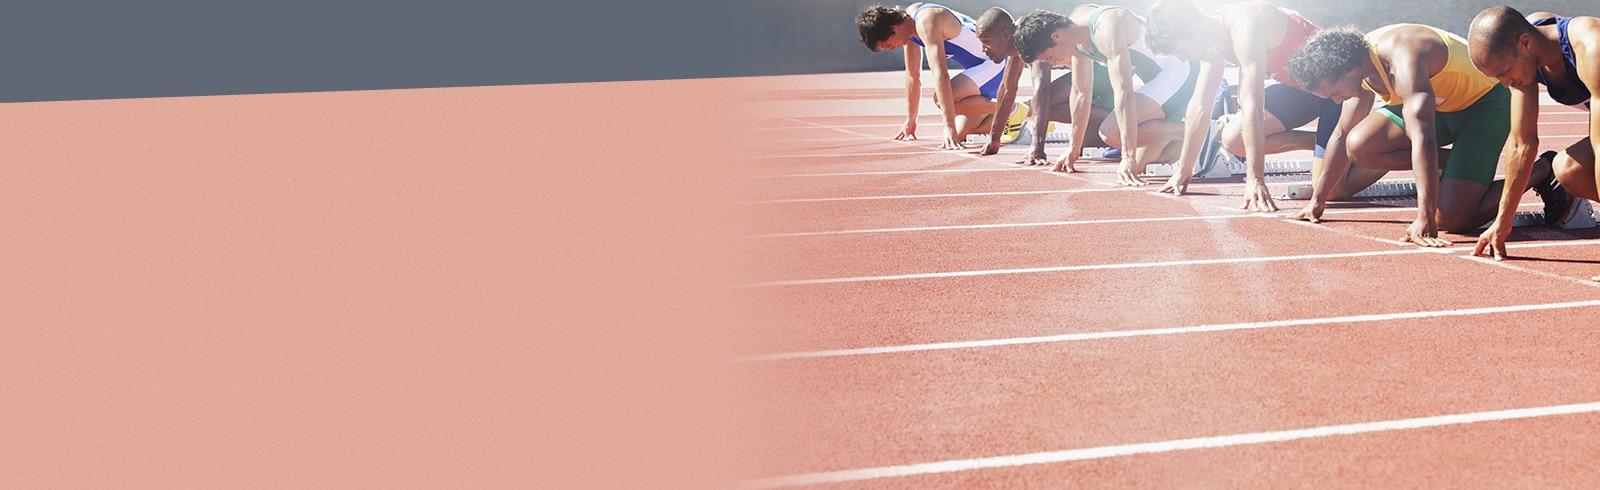 Running Track, Person, Sport